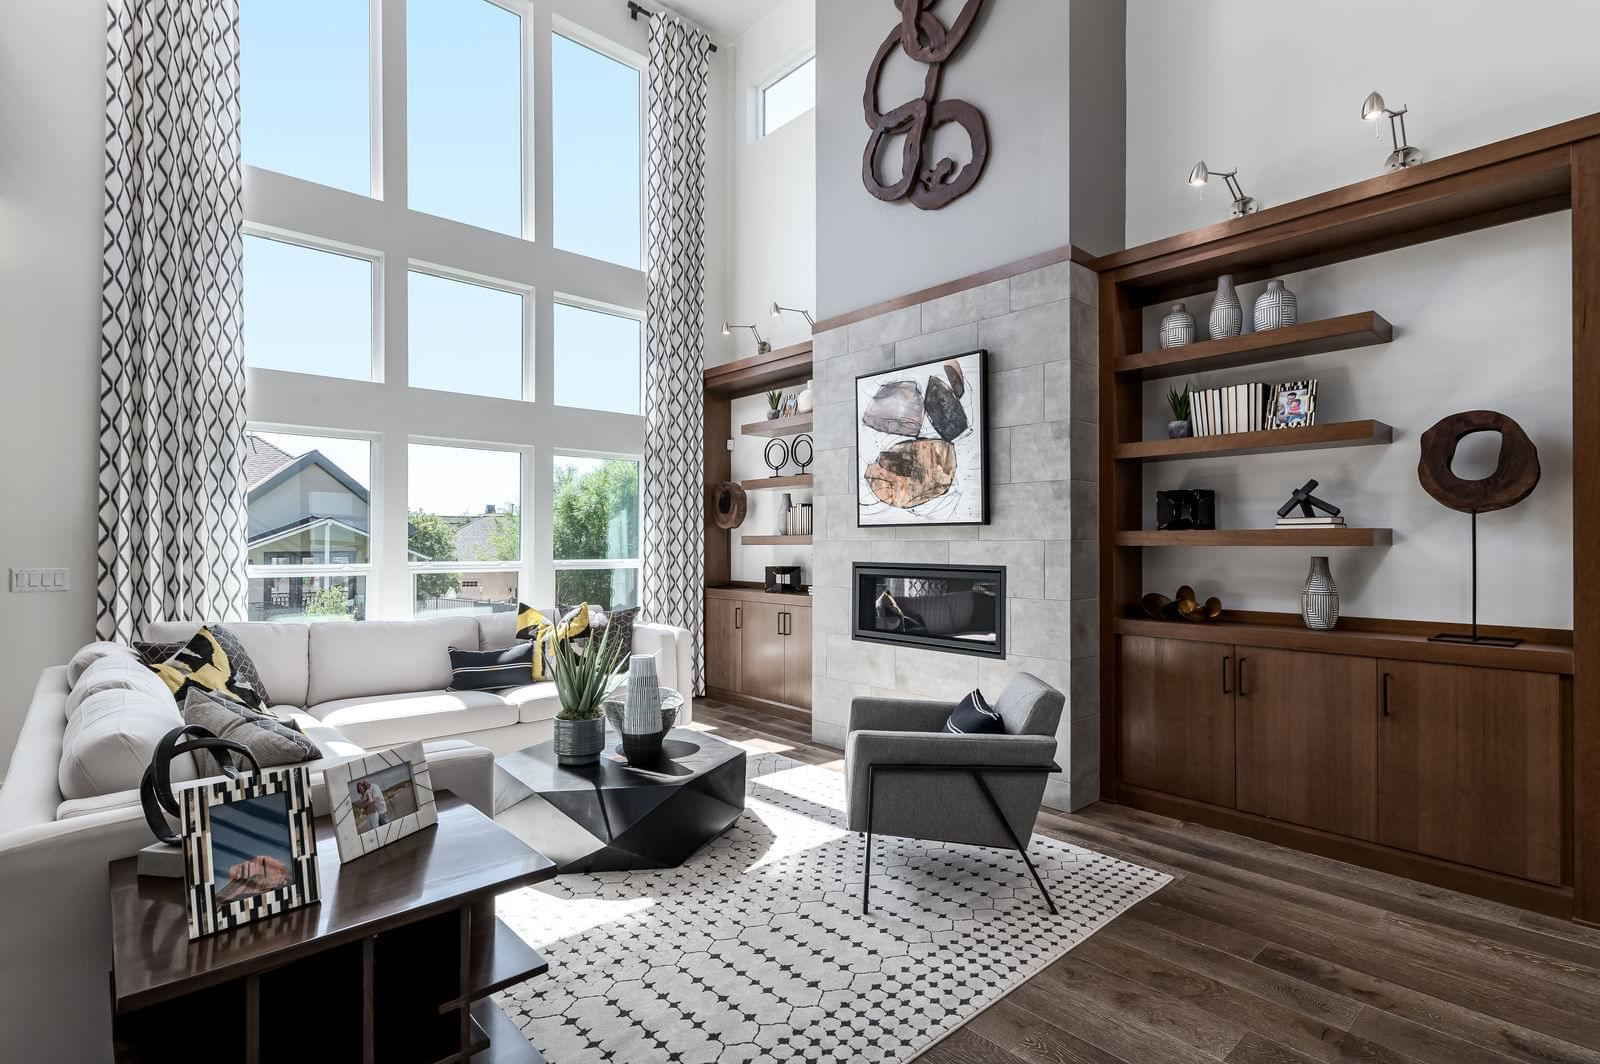 Vista Ridge new Homes in Lehi, UT